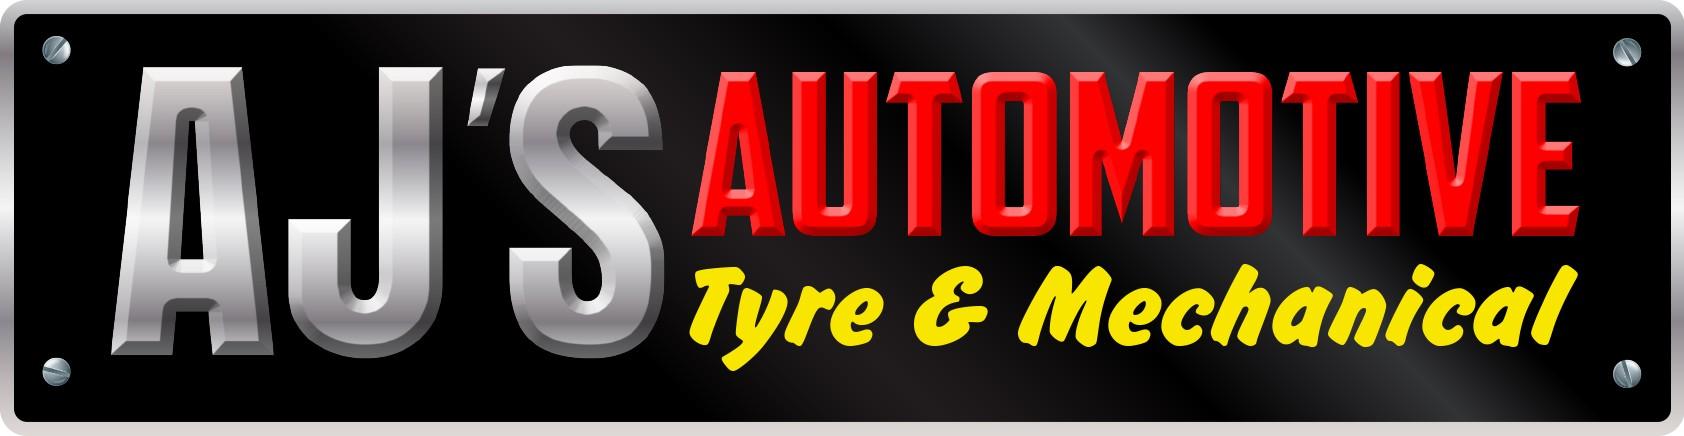 AJ's Automotive Tyre and Mechanical